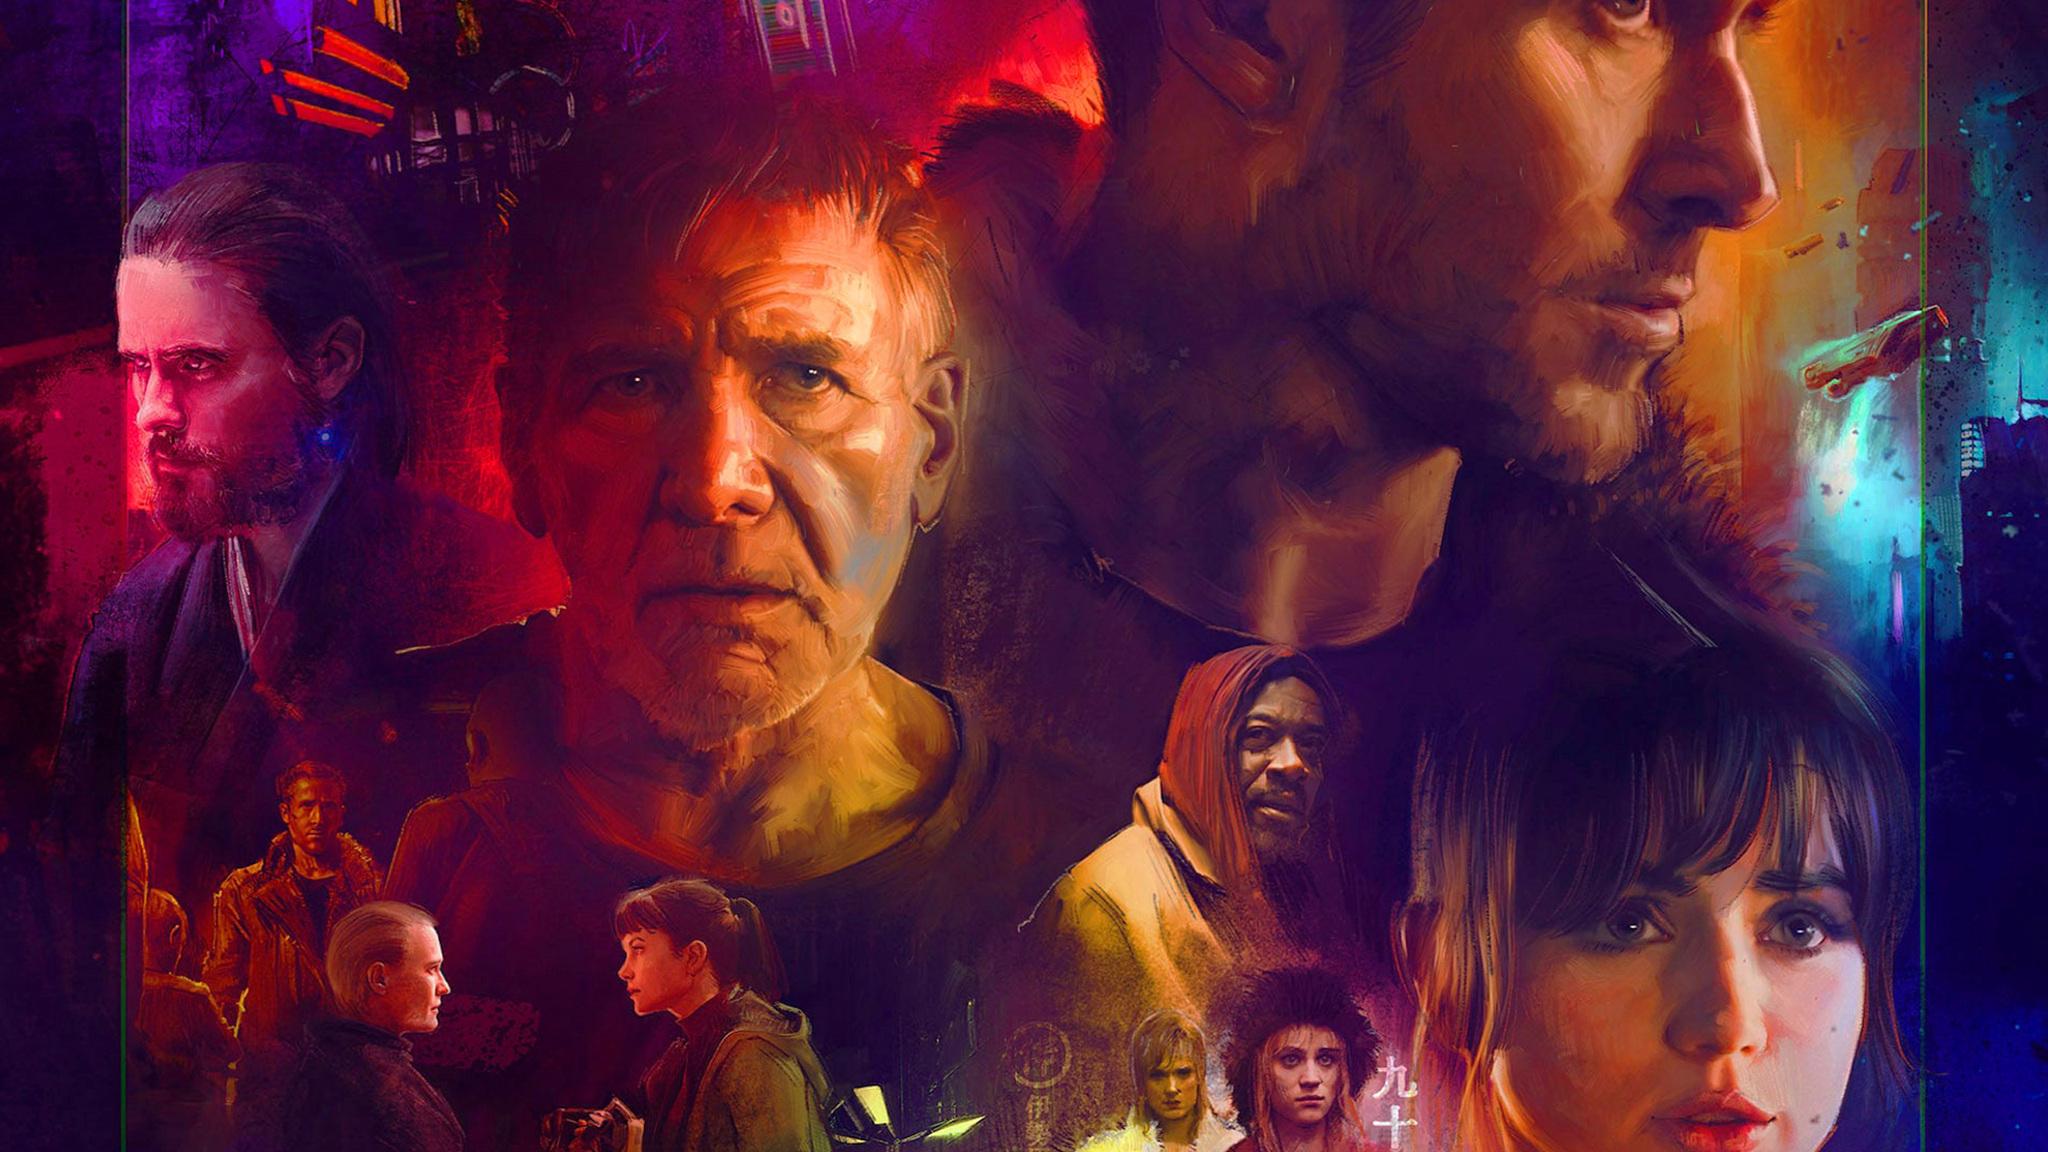 2048x1152 Pubg Fan Art 2048x1152 Resolution Hd 4k: 2048x1152 Blade Runner 2049 Fanart 2048x1152 Resolution HD